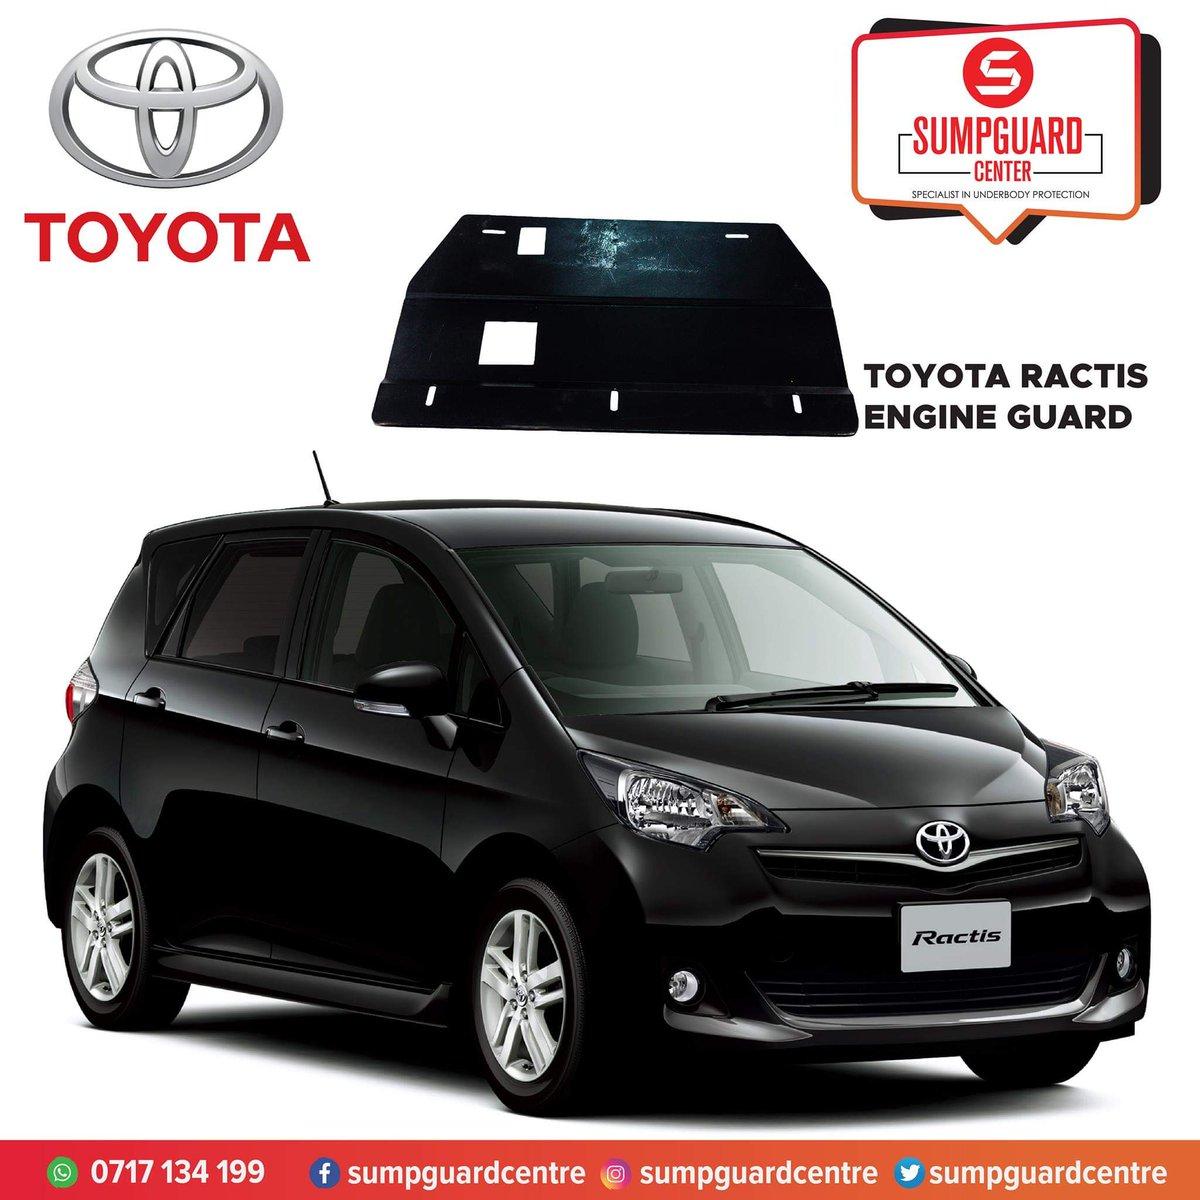 New Model Toyota Ractis 2019